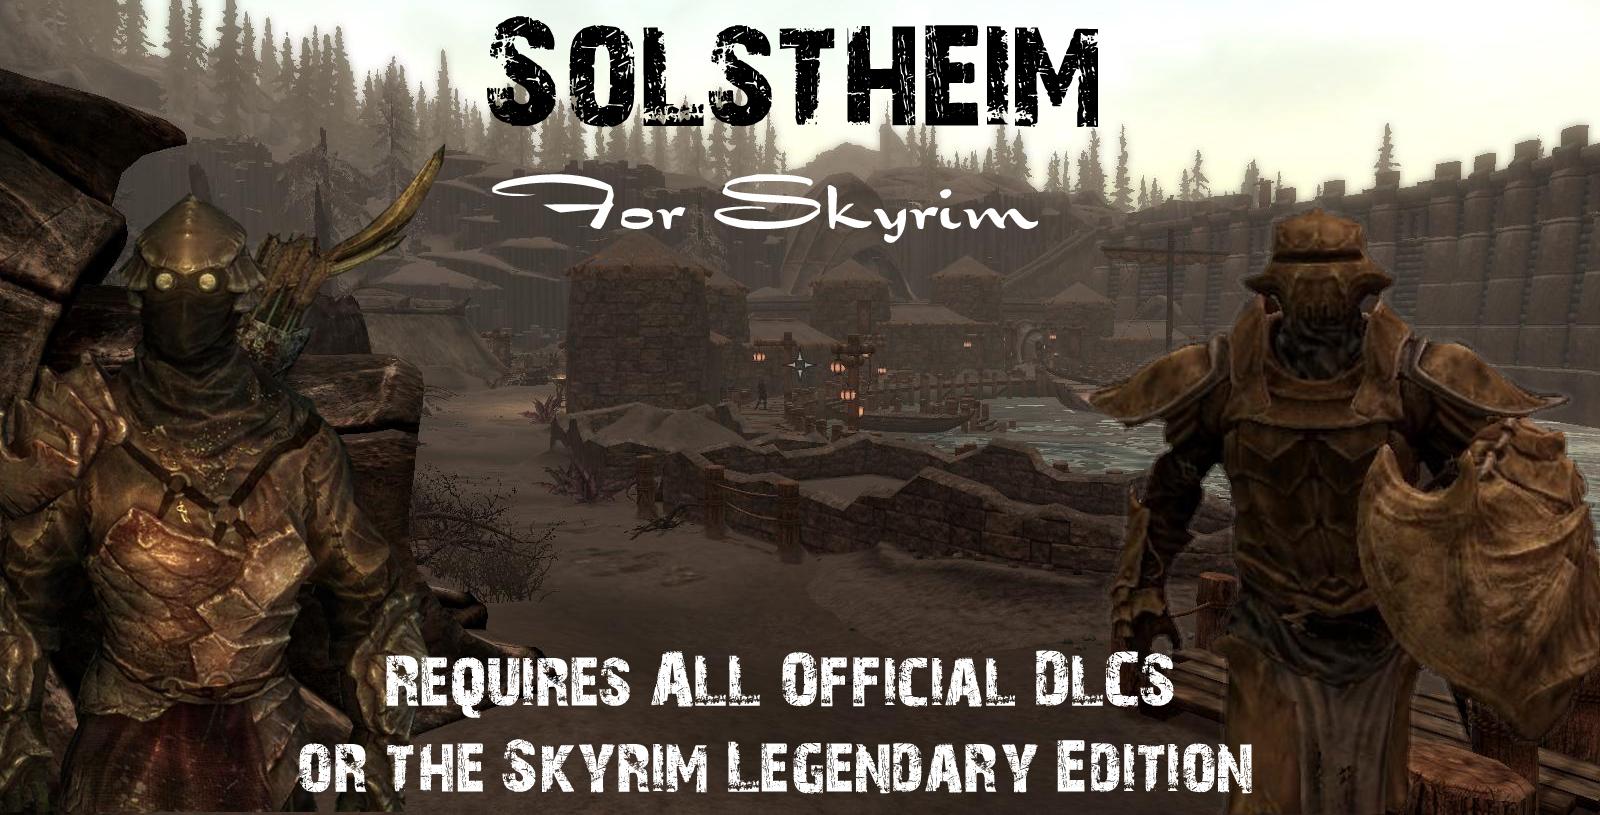 Solstheim V2 6 mod for Elder Scrolls V: Skyrim - Mod DB